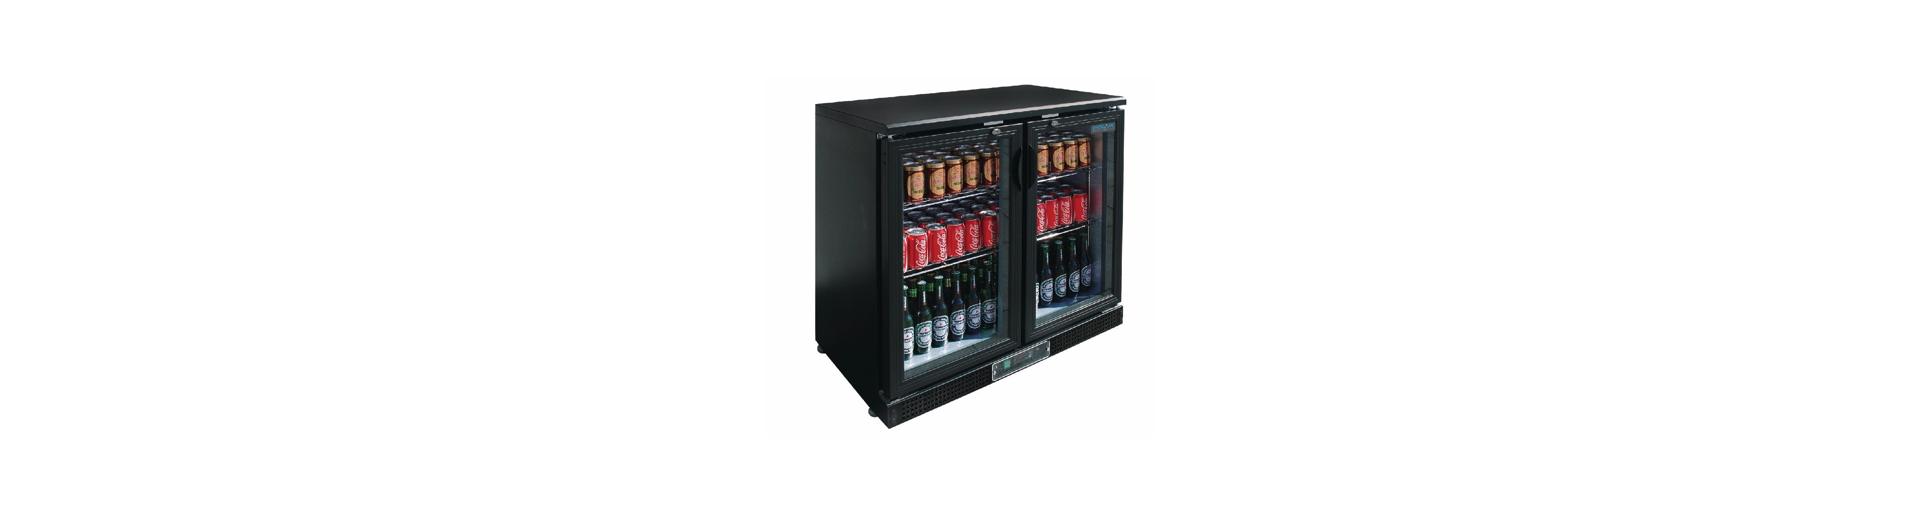 Back bar & refrigerated display case